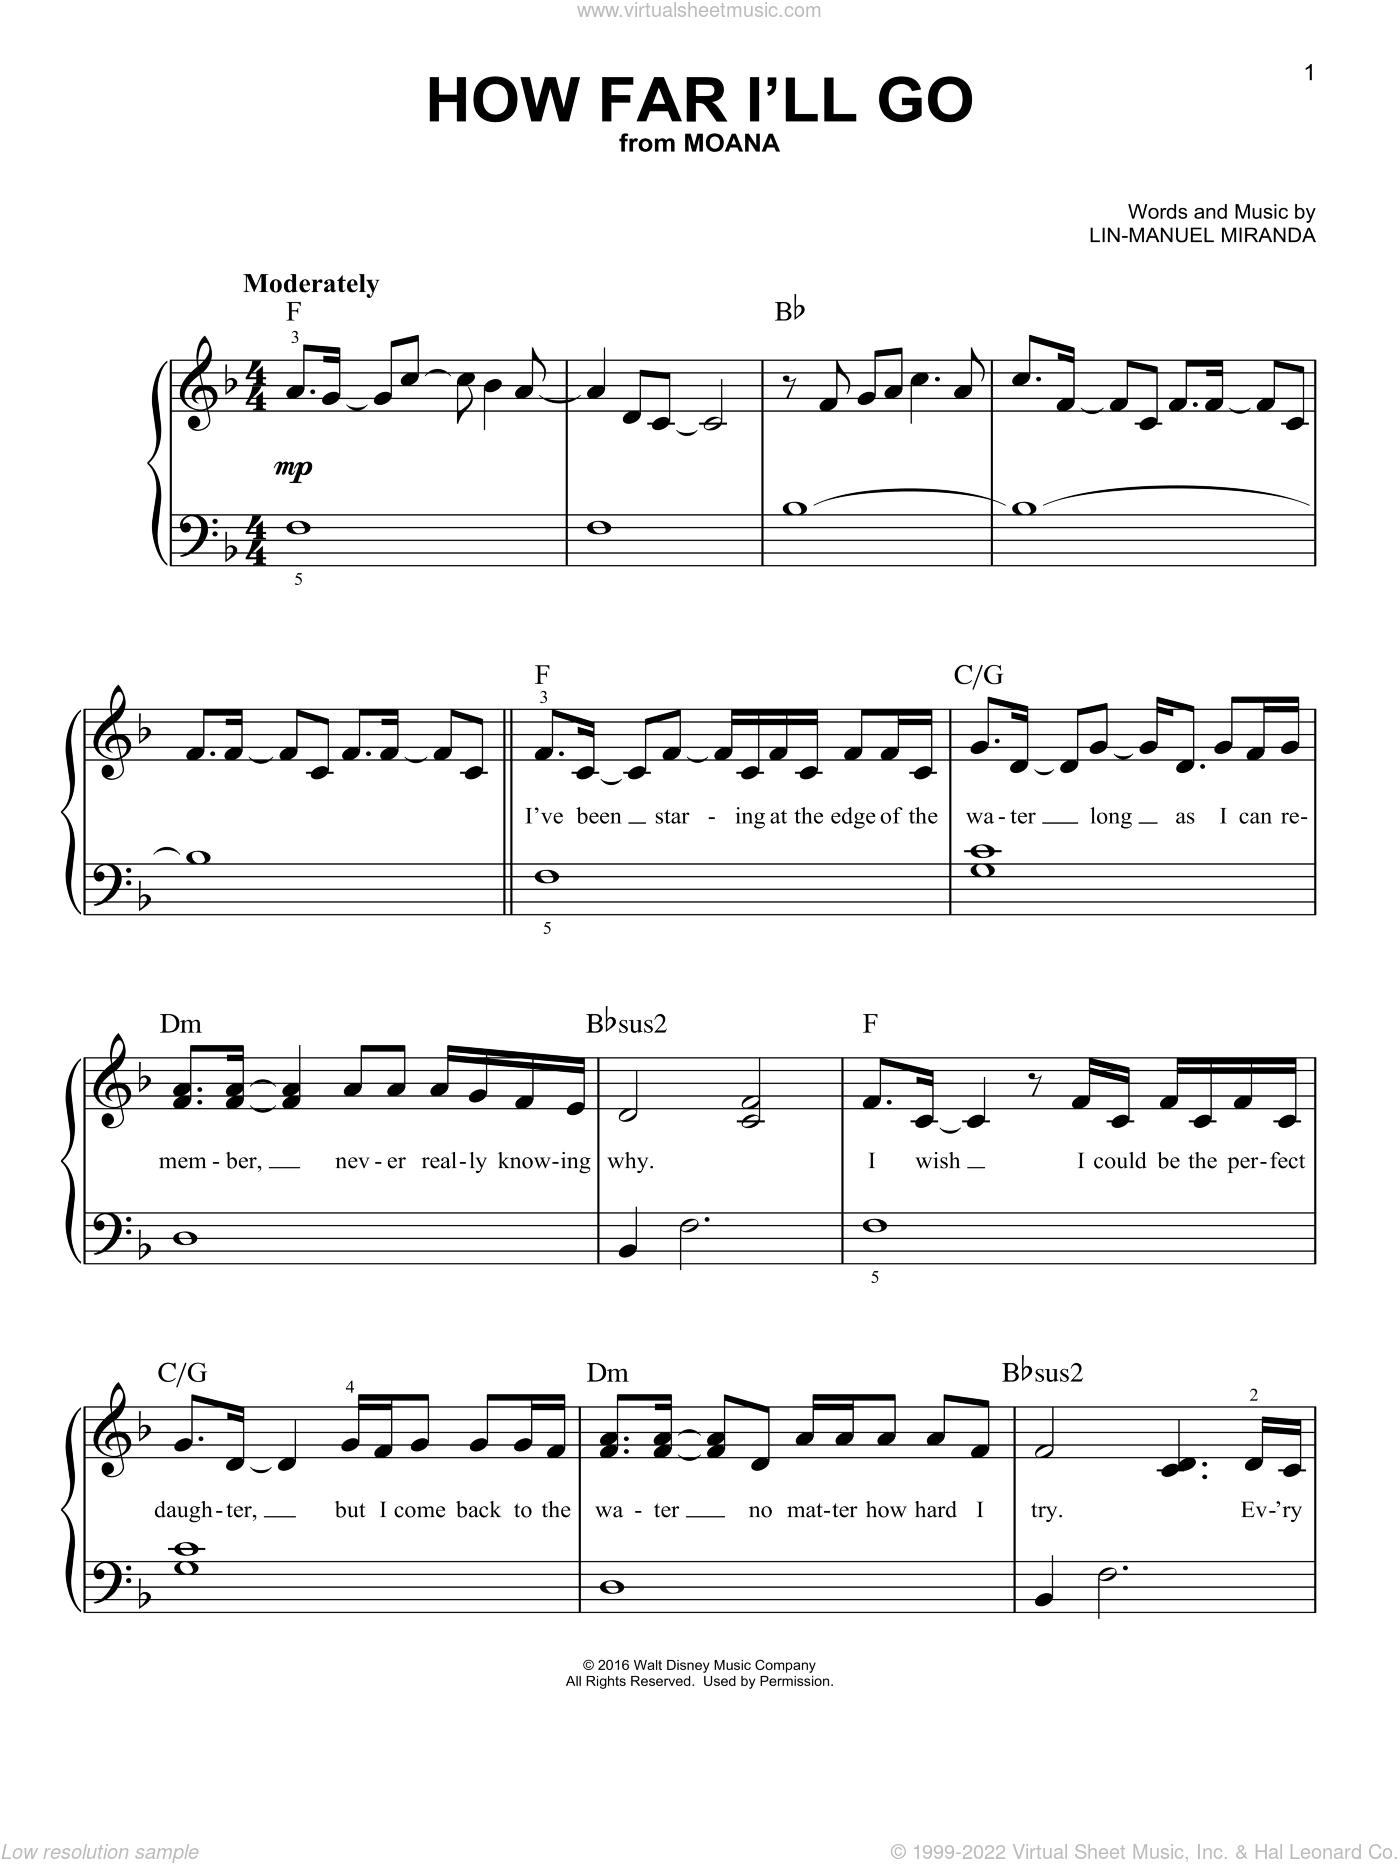 Cara - How Far I'll Go sheet music for piano solo [PDF]